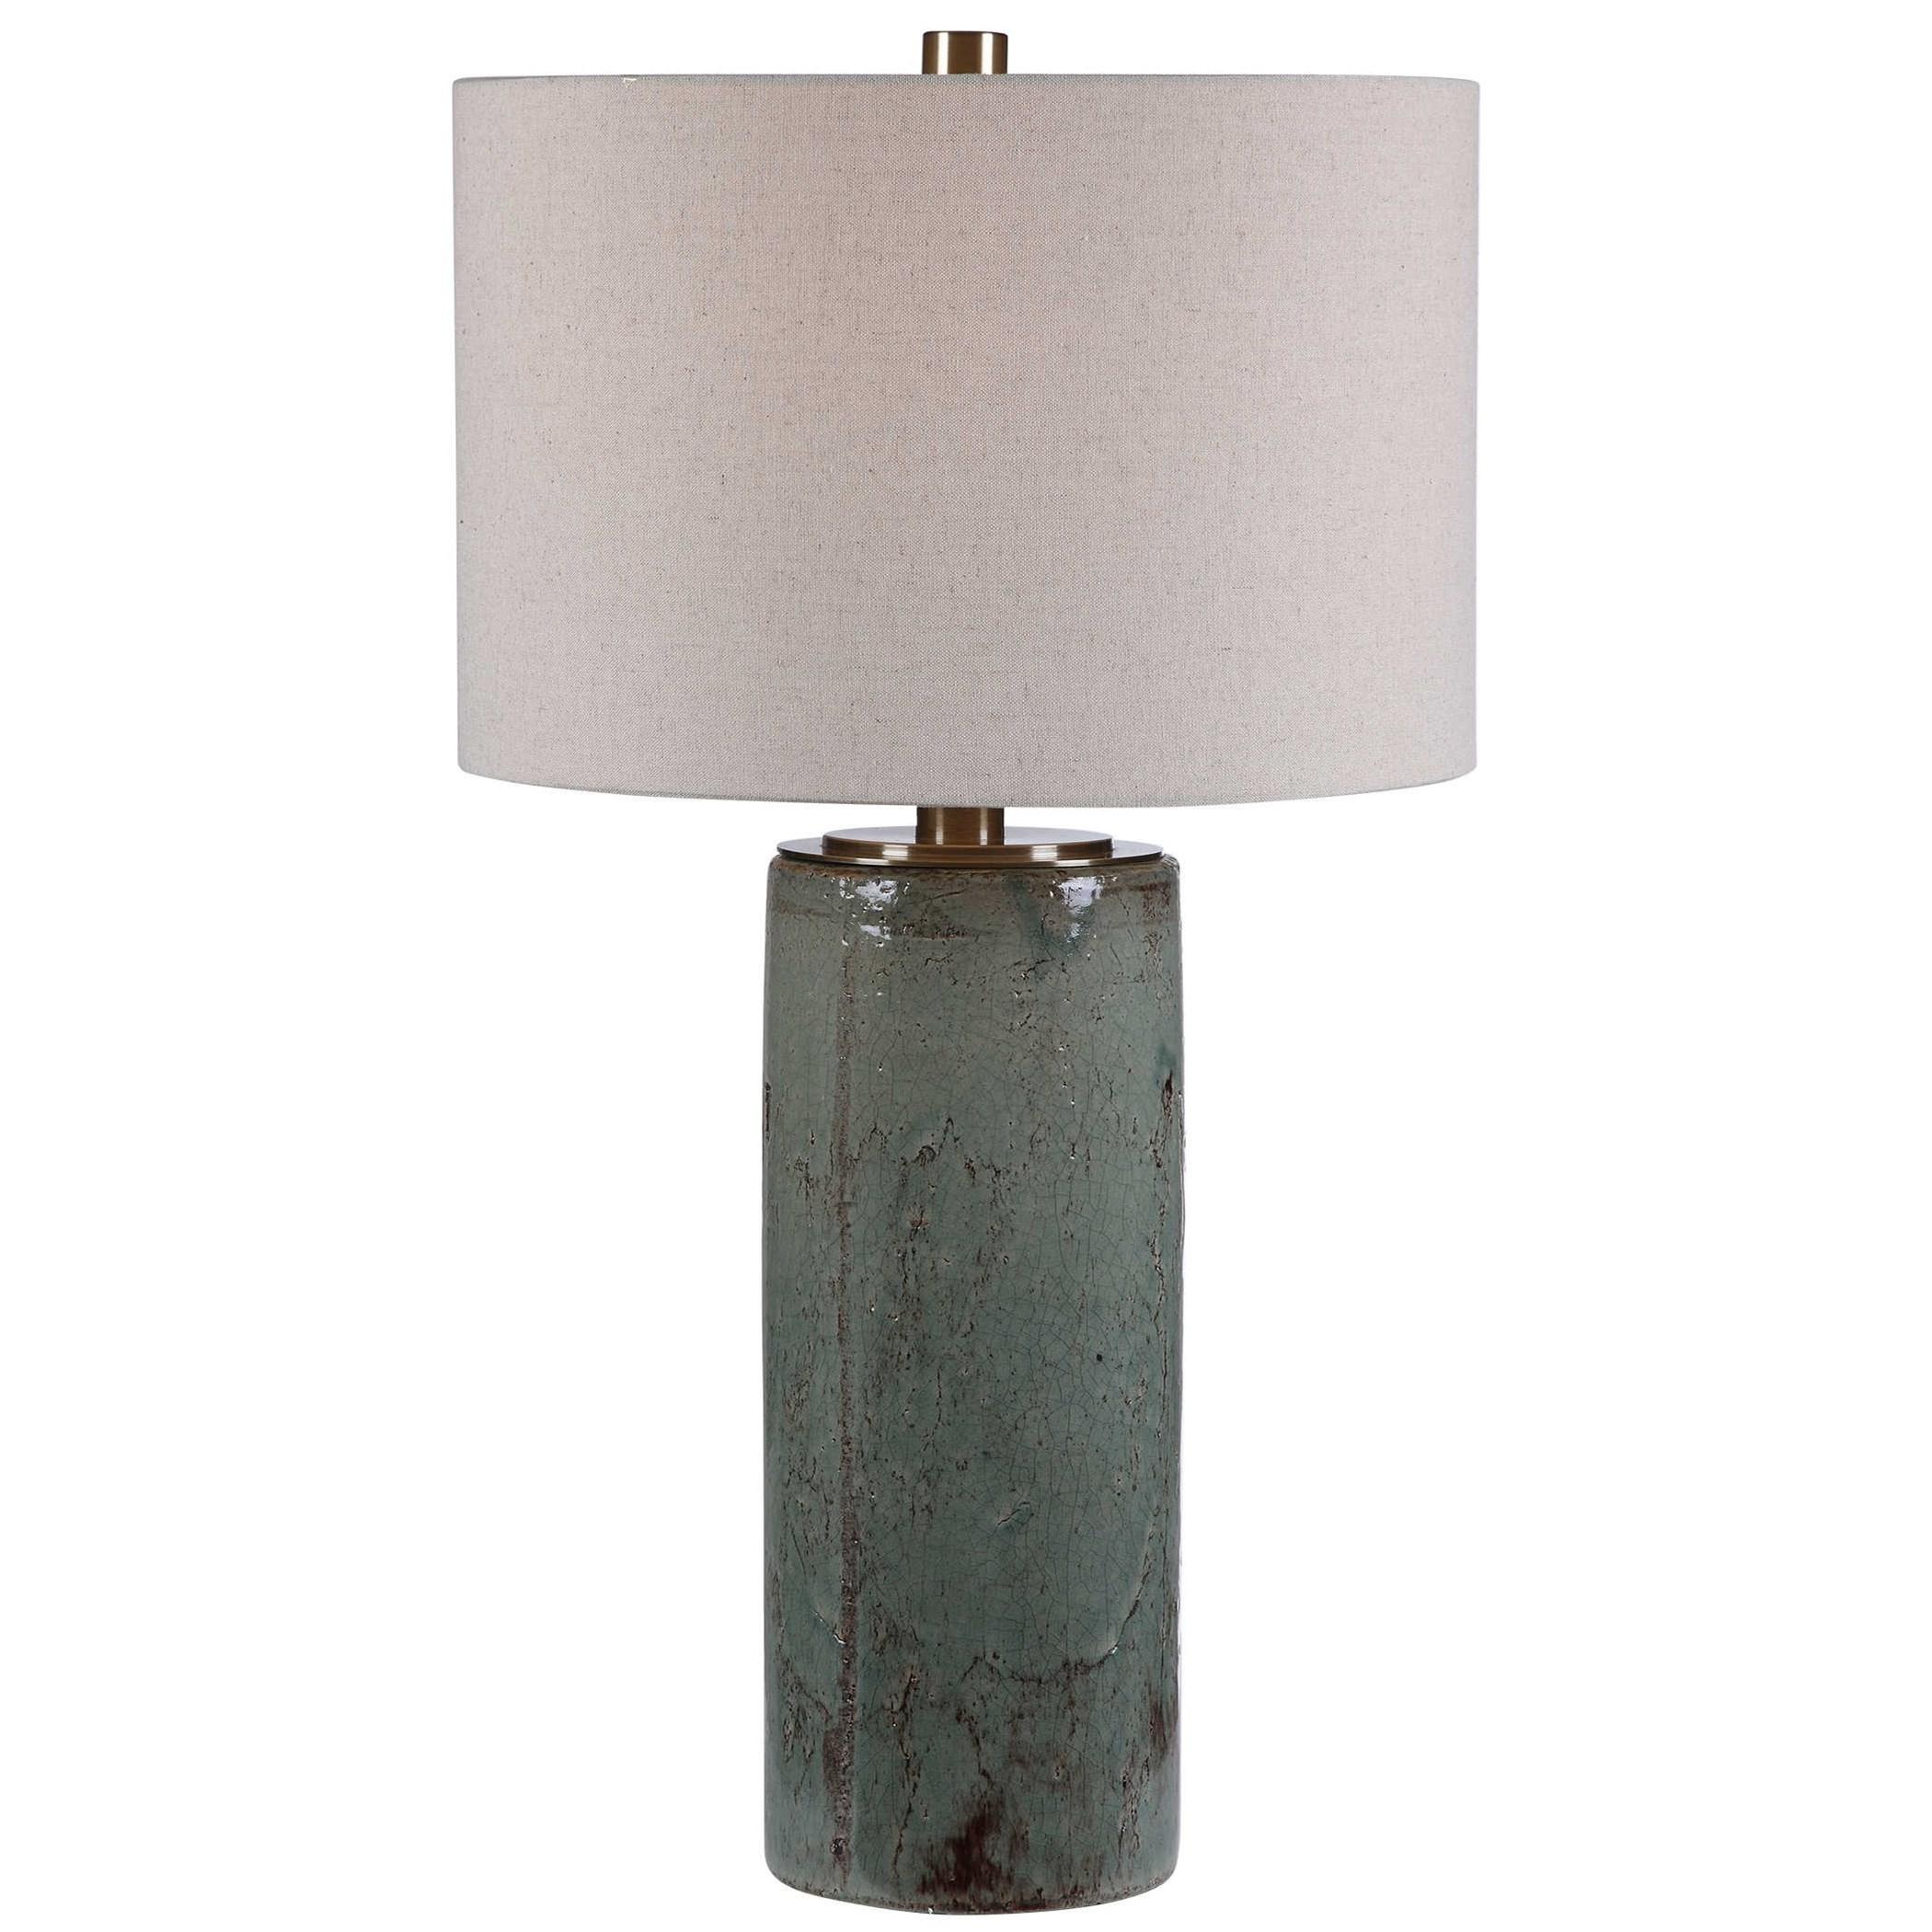 Callais Crackled Aqua Table Lamp